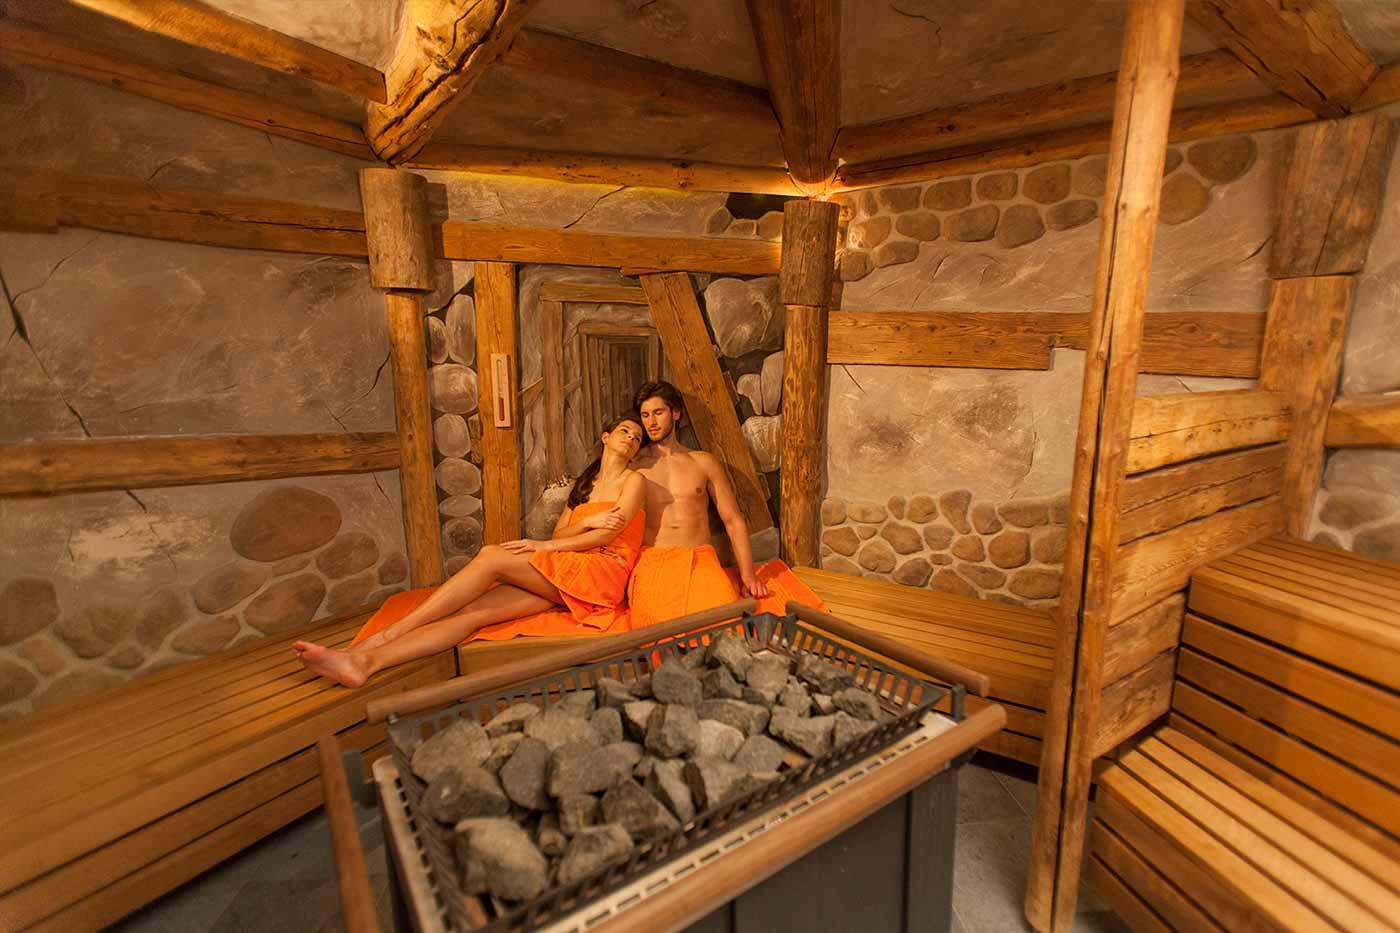 aquabasilea-saunawelt-teaser-01